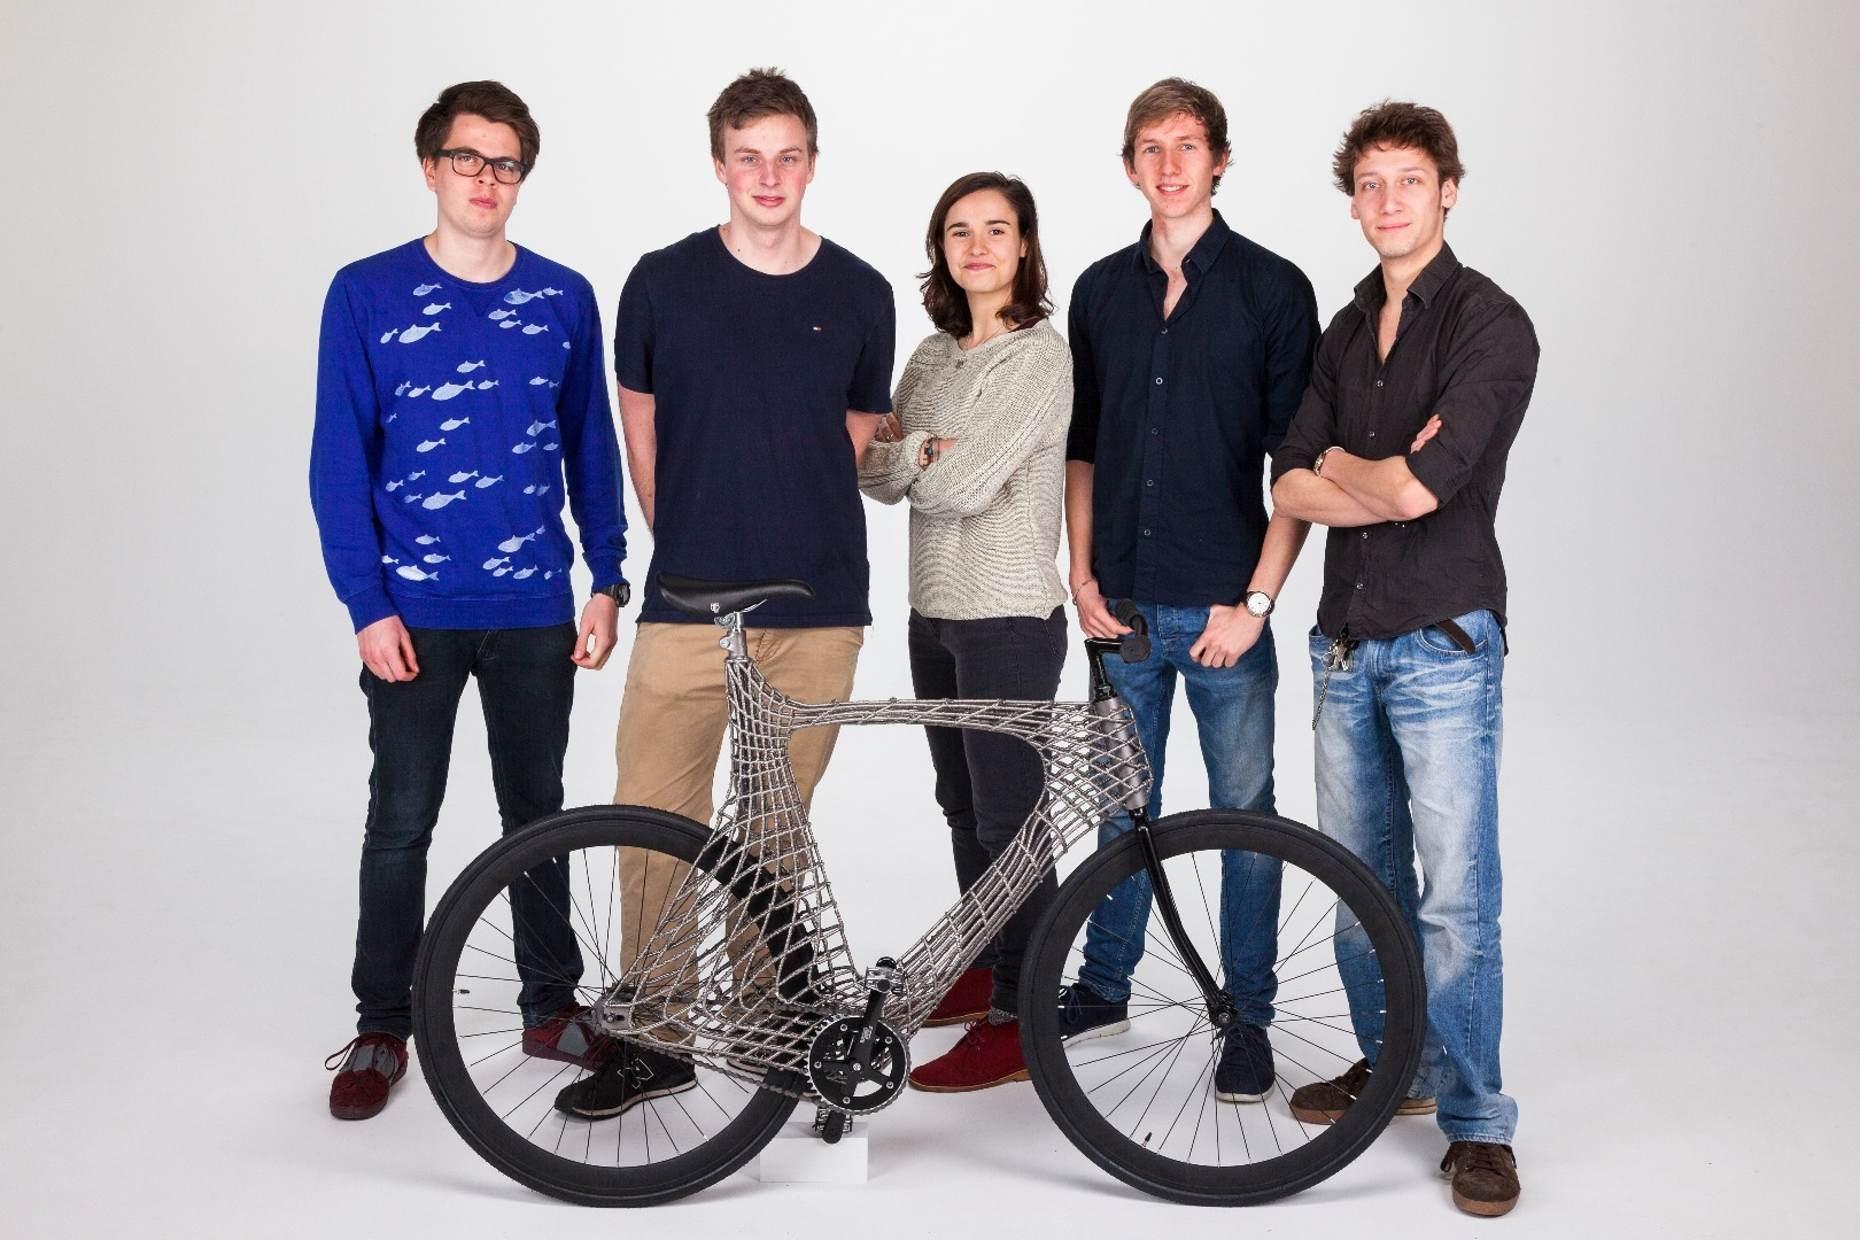 stainless-steel-3d-printed-arc-bicycle-10_01